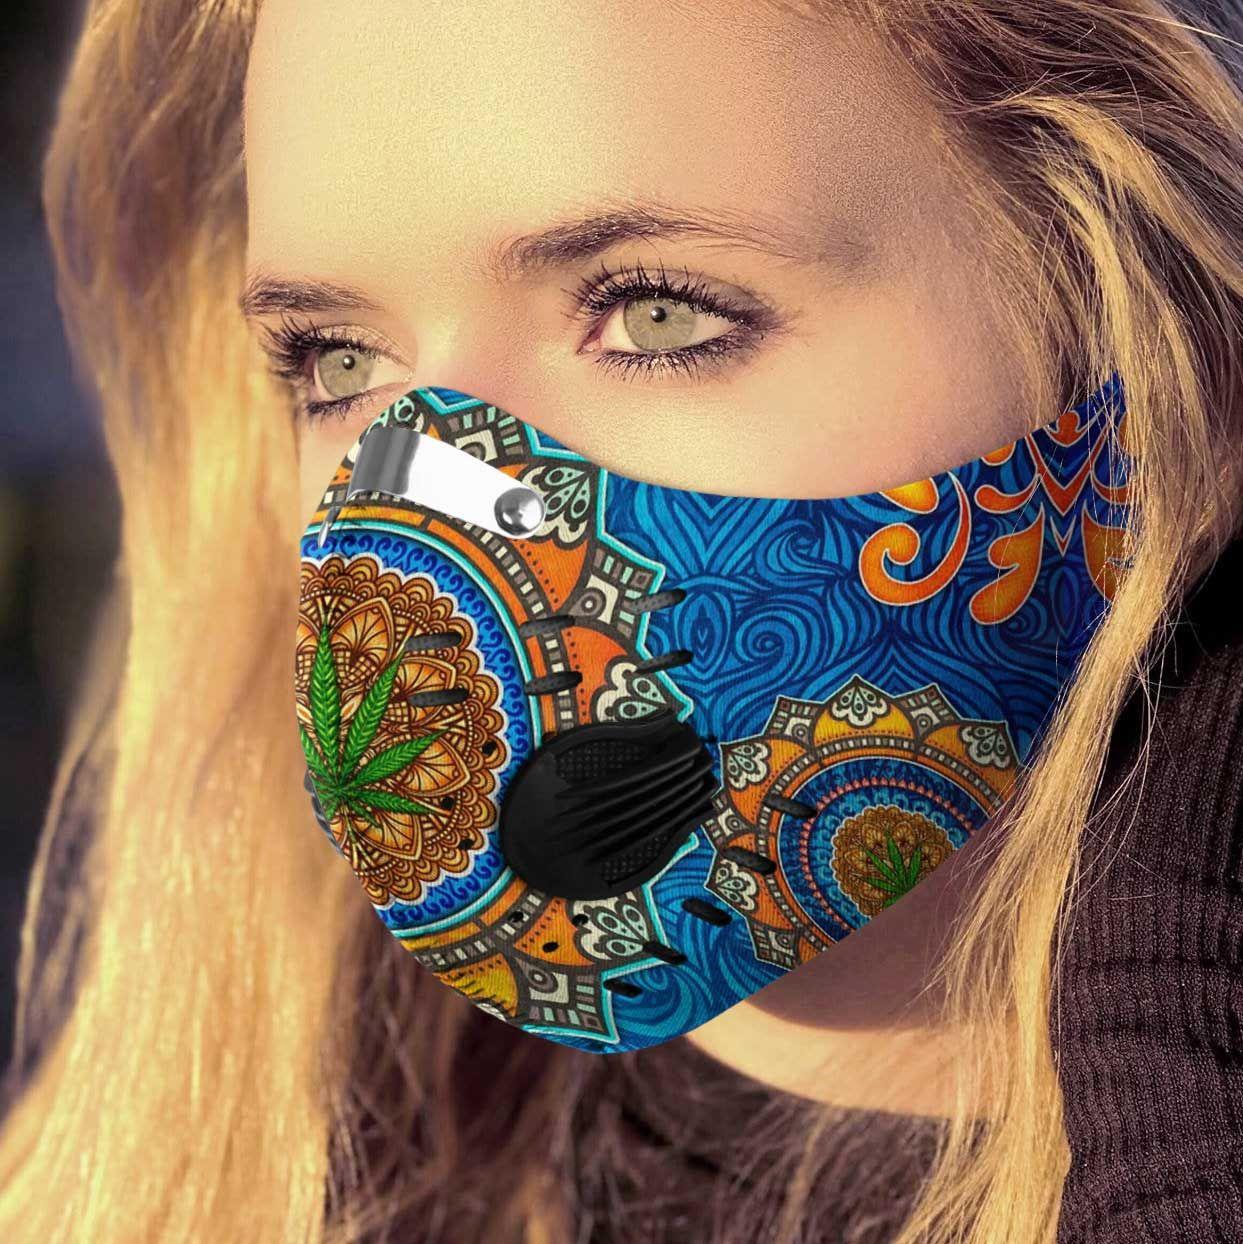 Cannabis fantasy world carbon pm 2,5 face mask 3